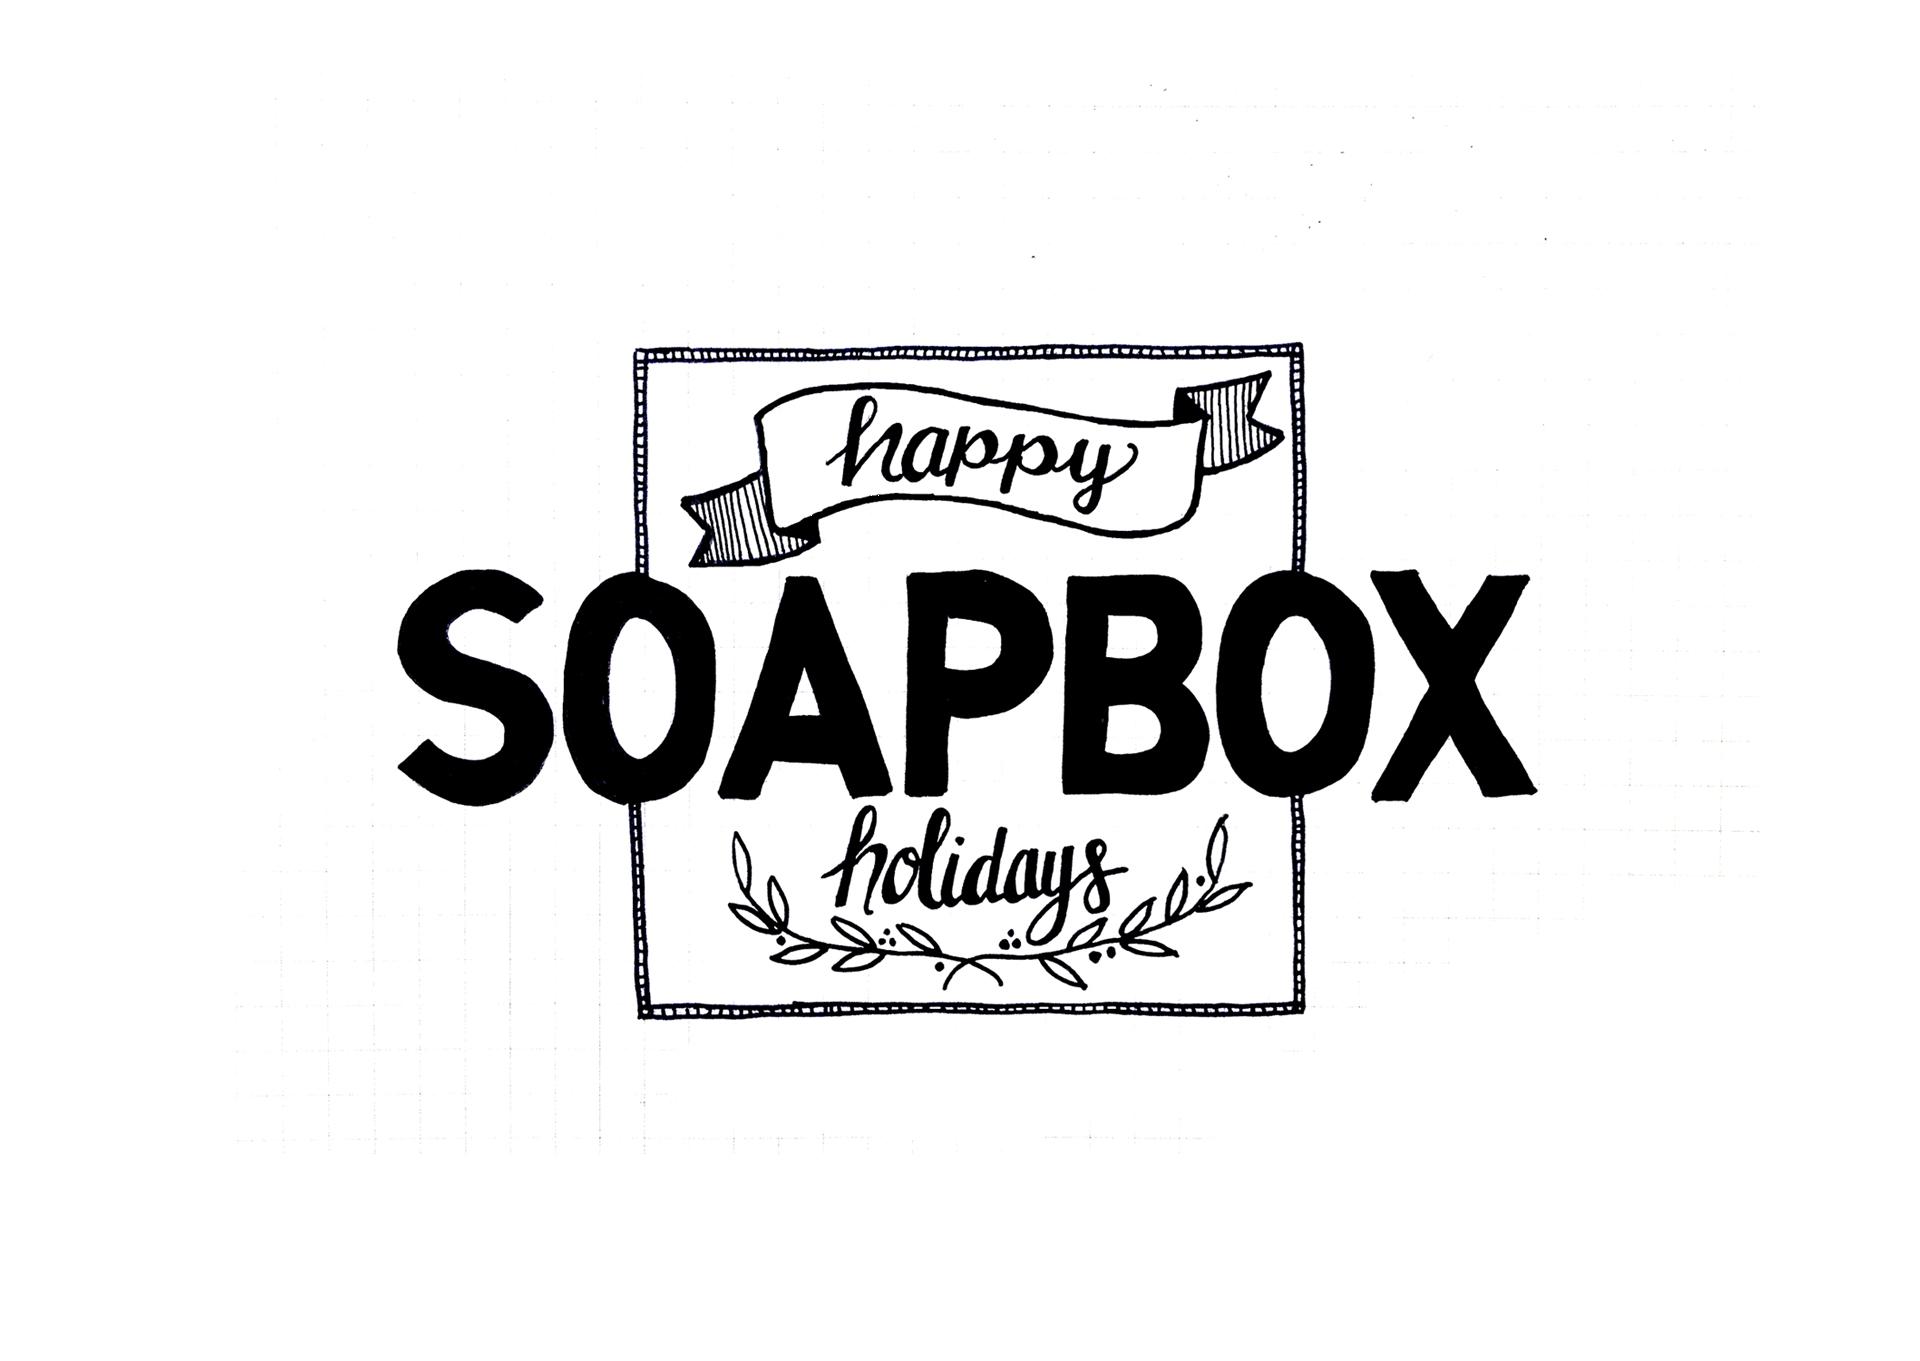 soapbox_holidays.jpg